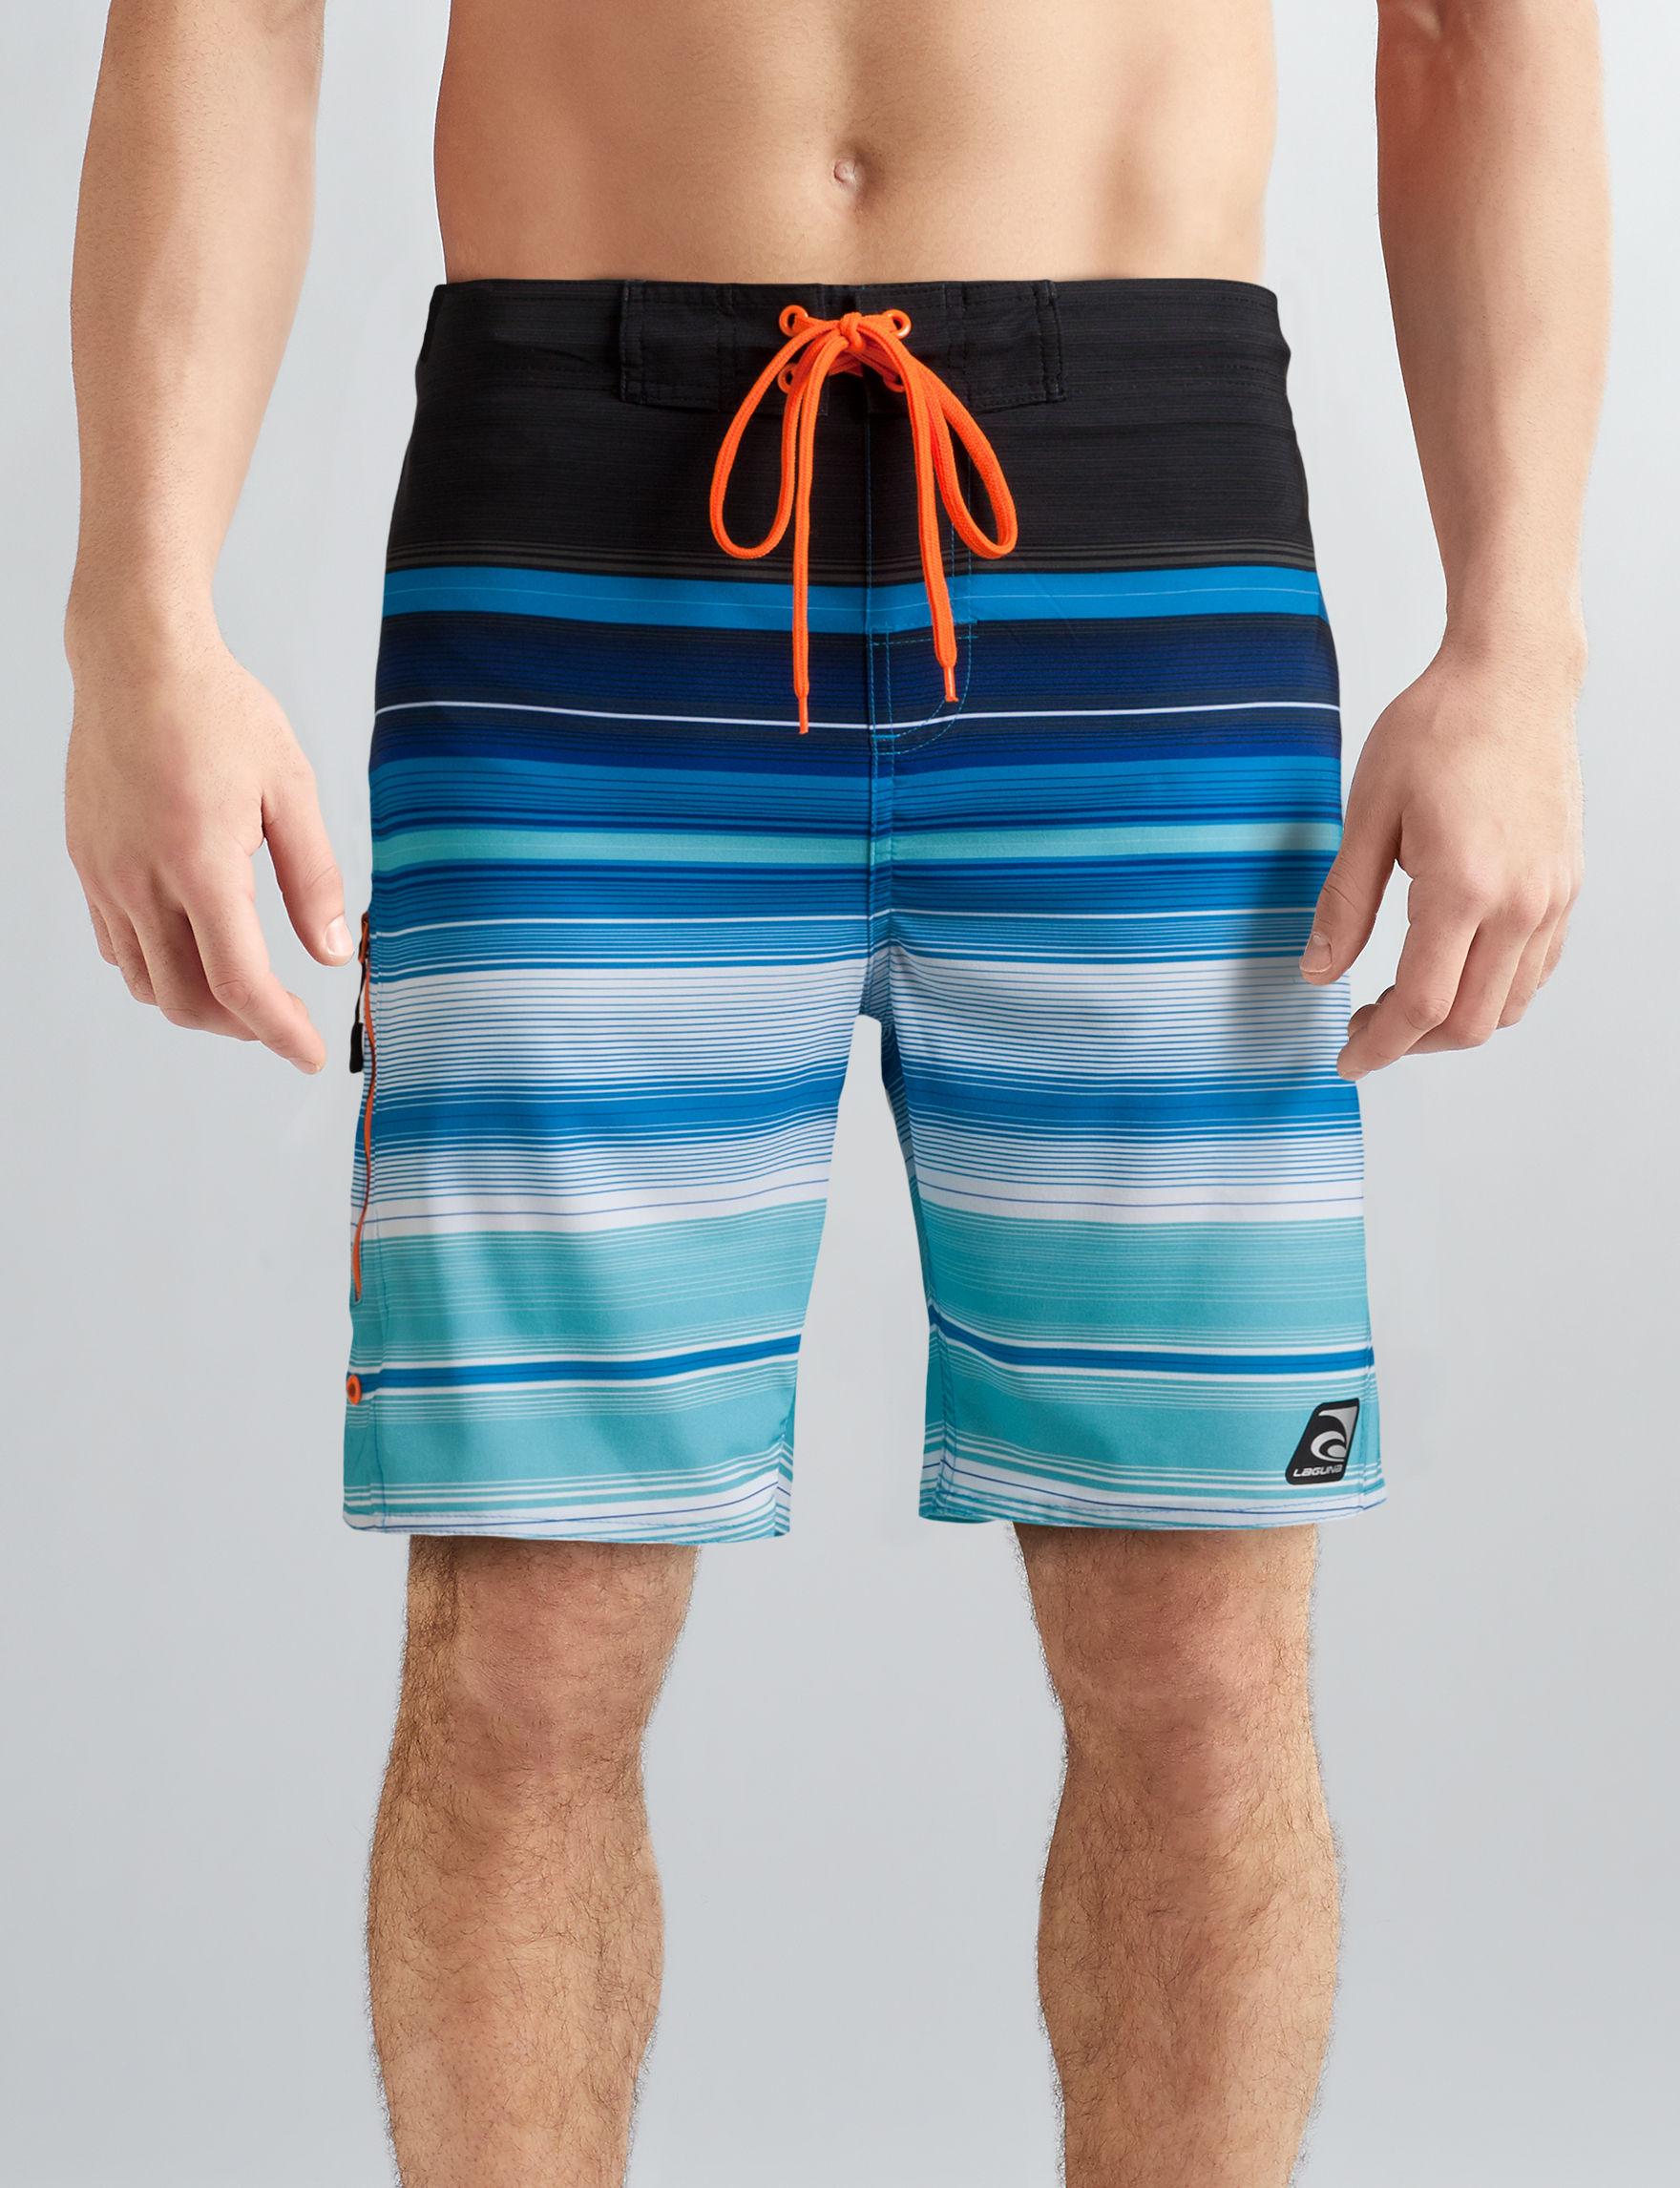 Laguna Blue Stripe Swimsuit Bottoms